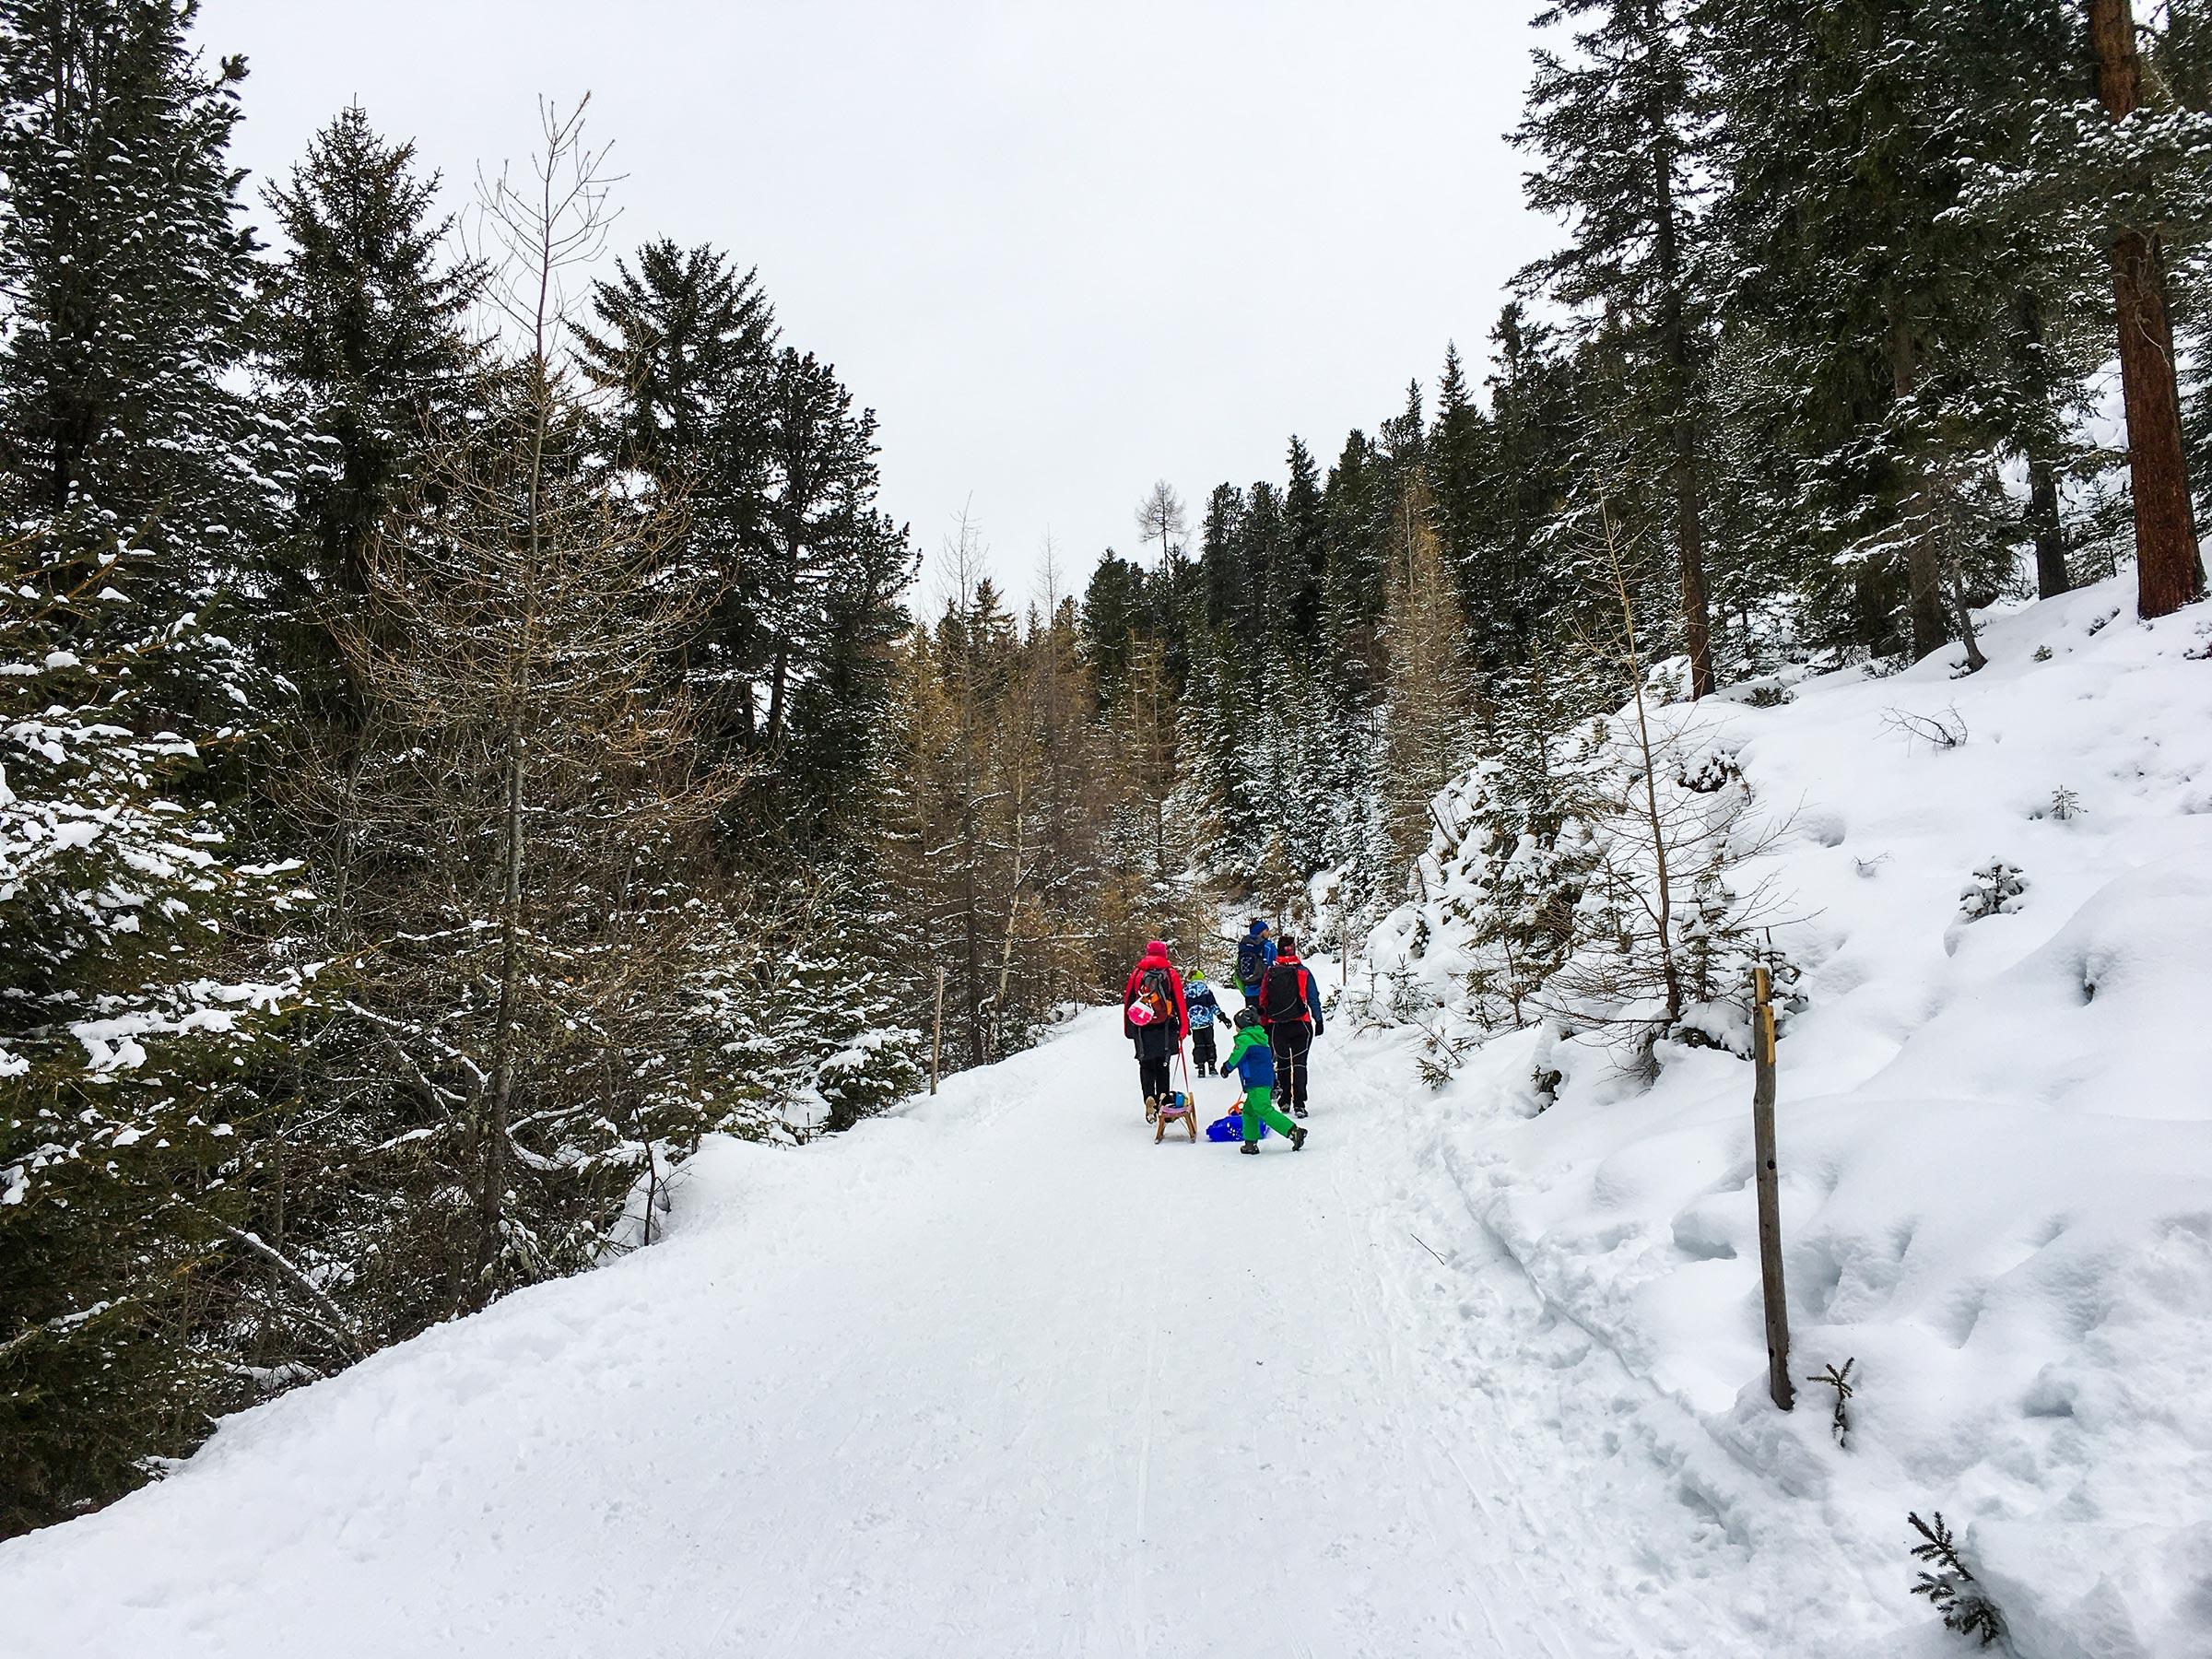 Auf dem Weg zur Feldringalm - Rodeln Ötztal